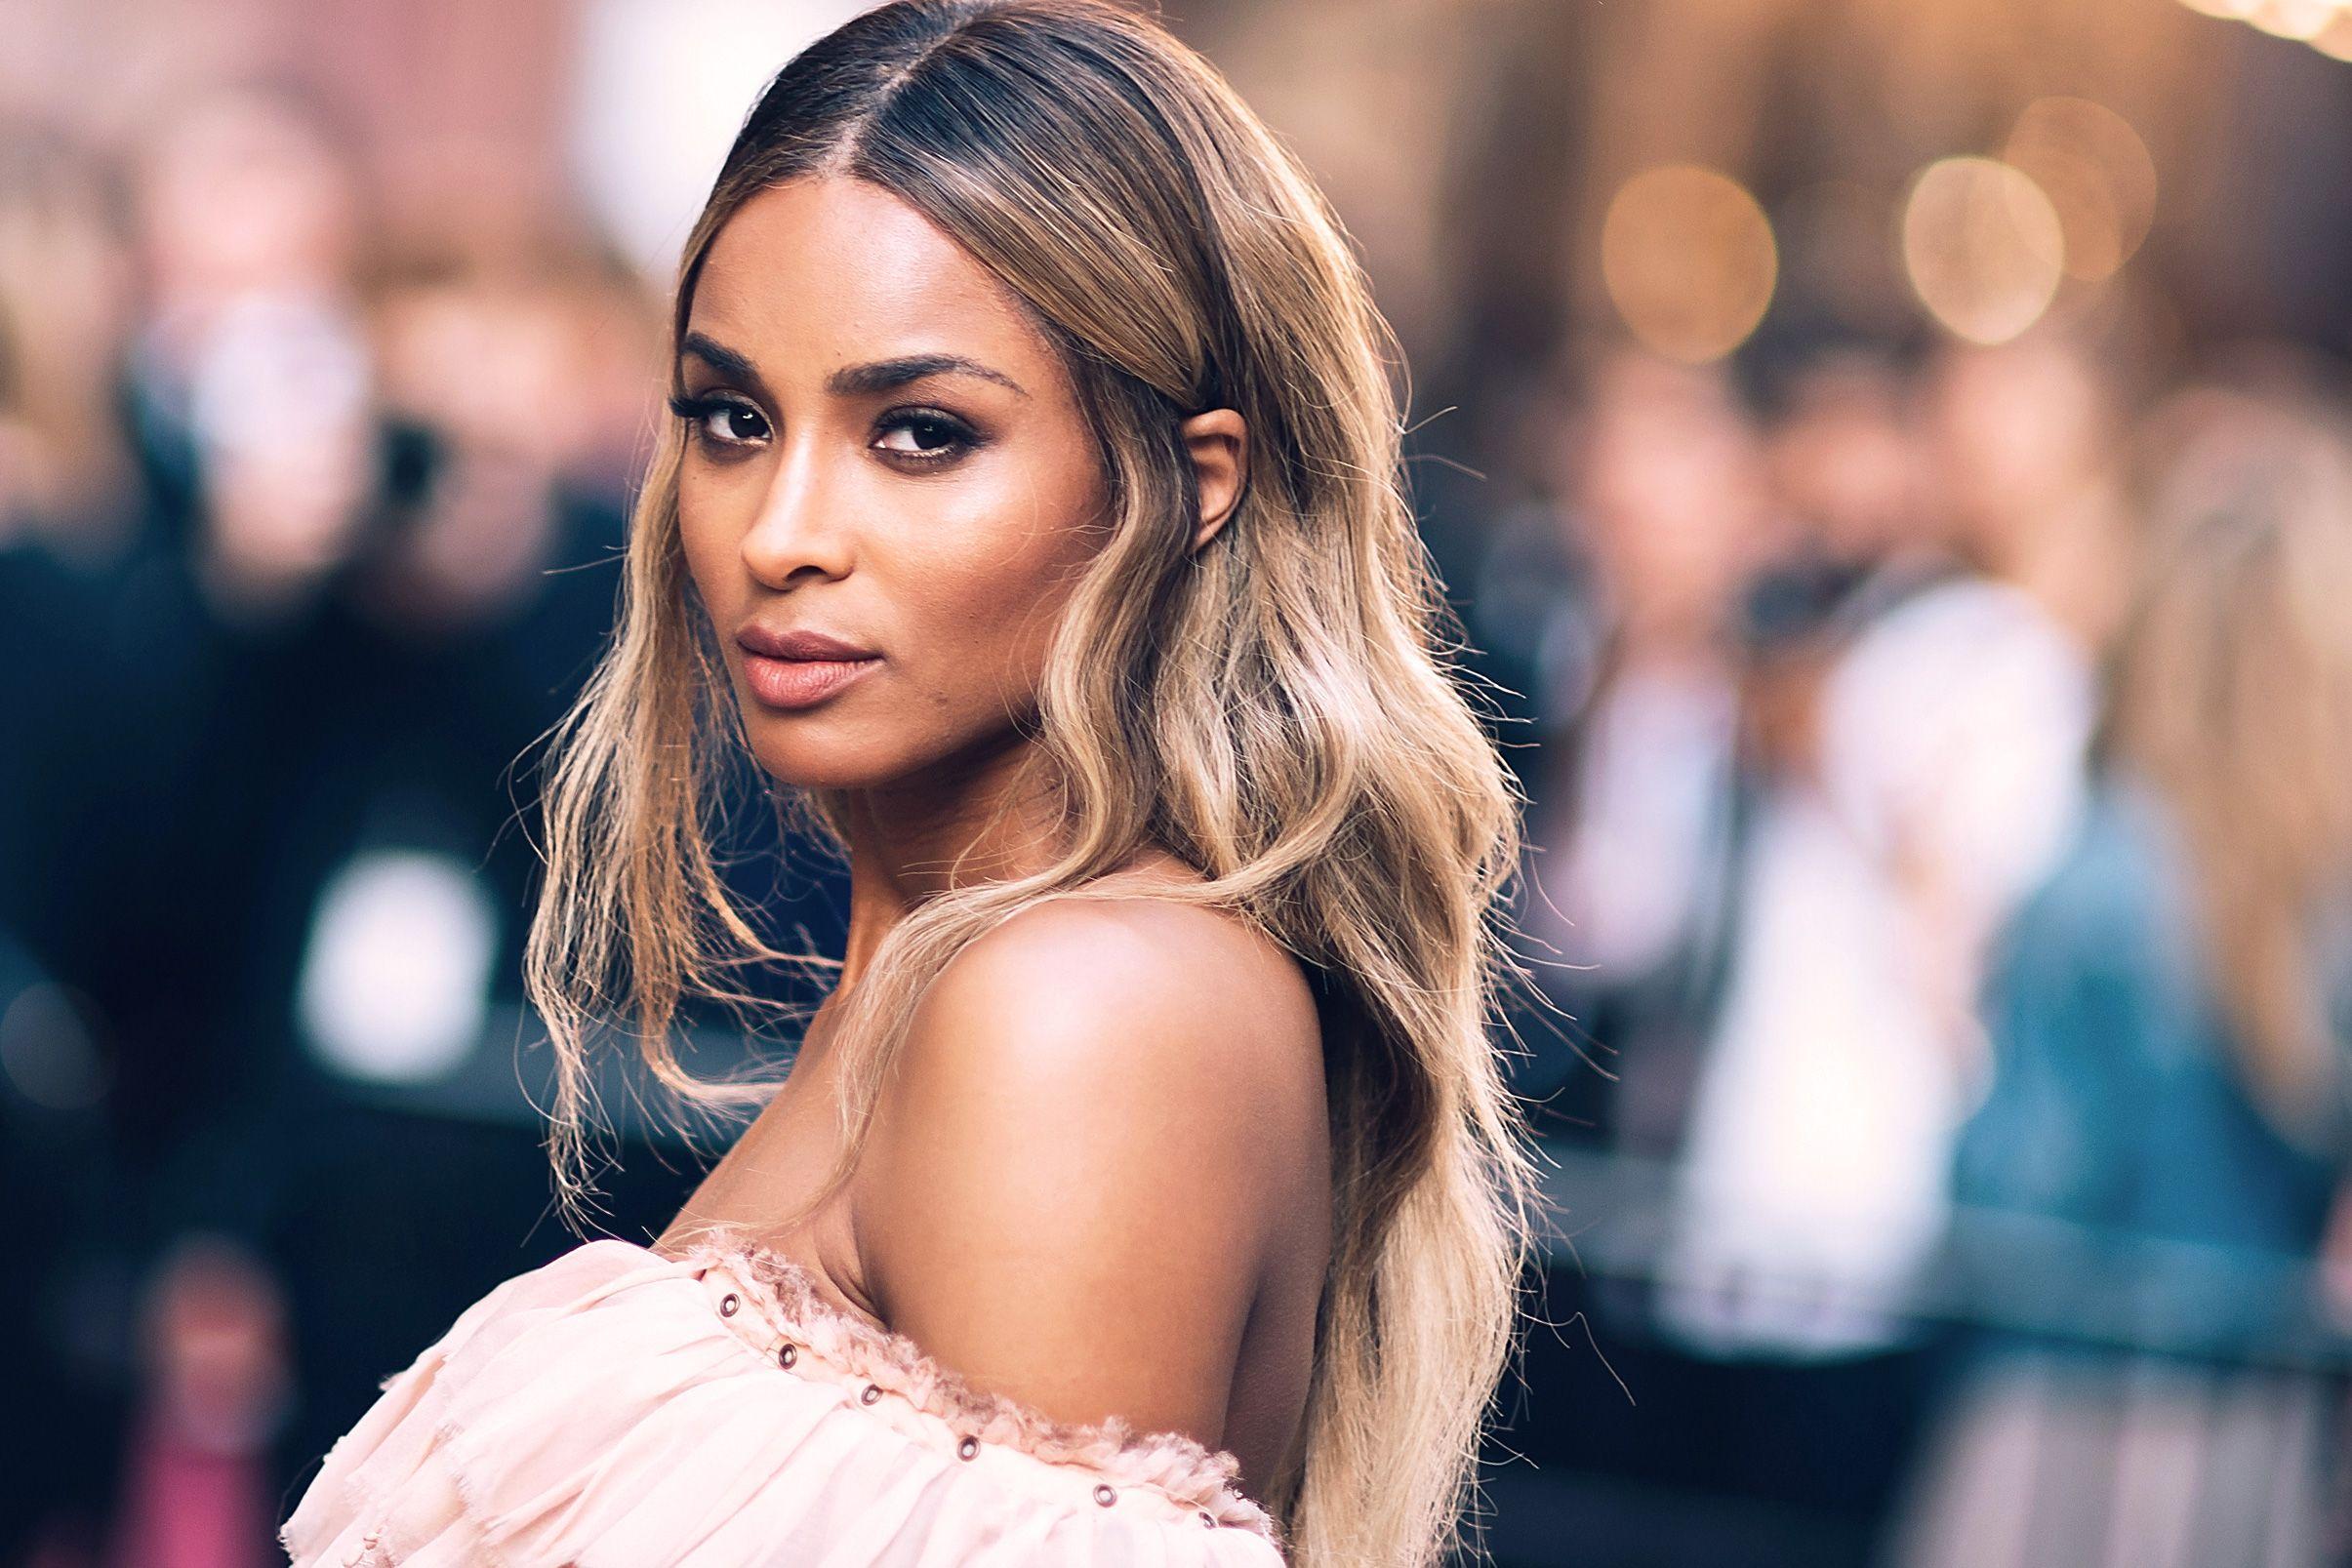 15 Ash Brown Hair Color Ideas 2020 Try Ash Brown Hair Dye Trend Now